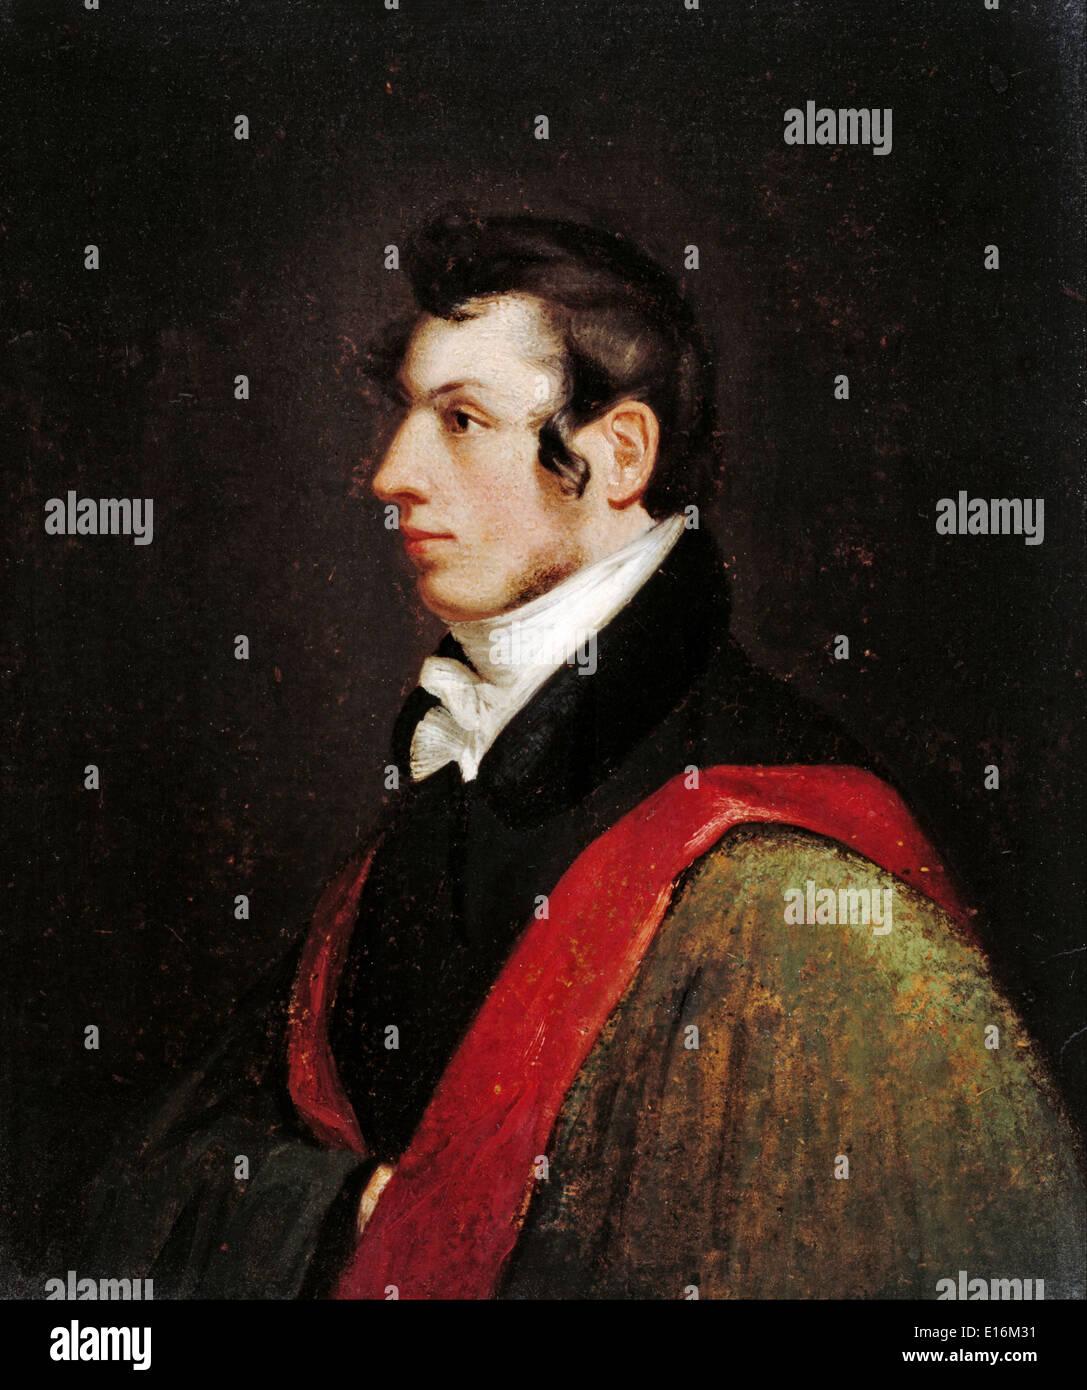 Samuel Morse (the Morse code inventor), Self-portrait, 1812 - Stock Image